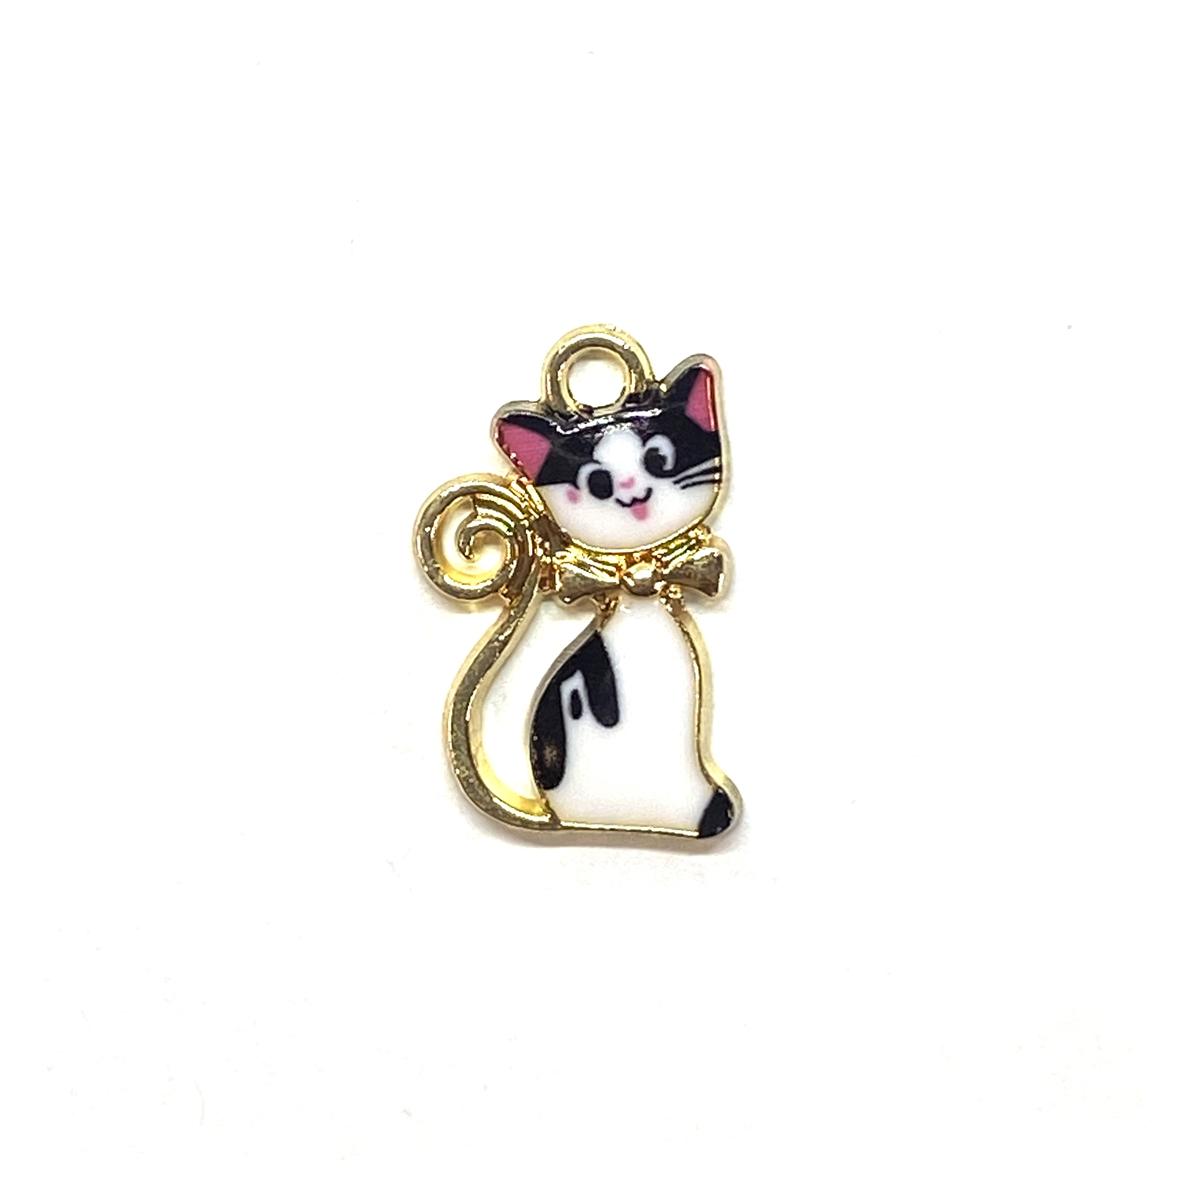 2 Gold Plated Enamel Cat Pendant Charms 13mm Black /& White